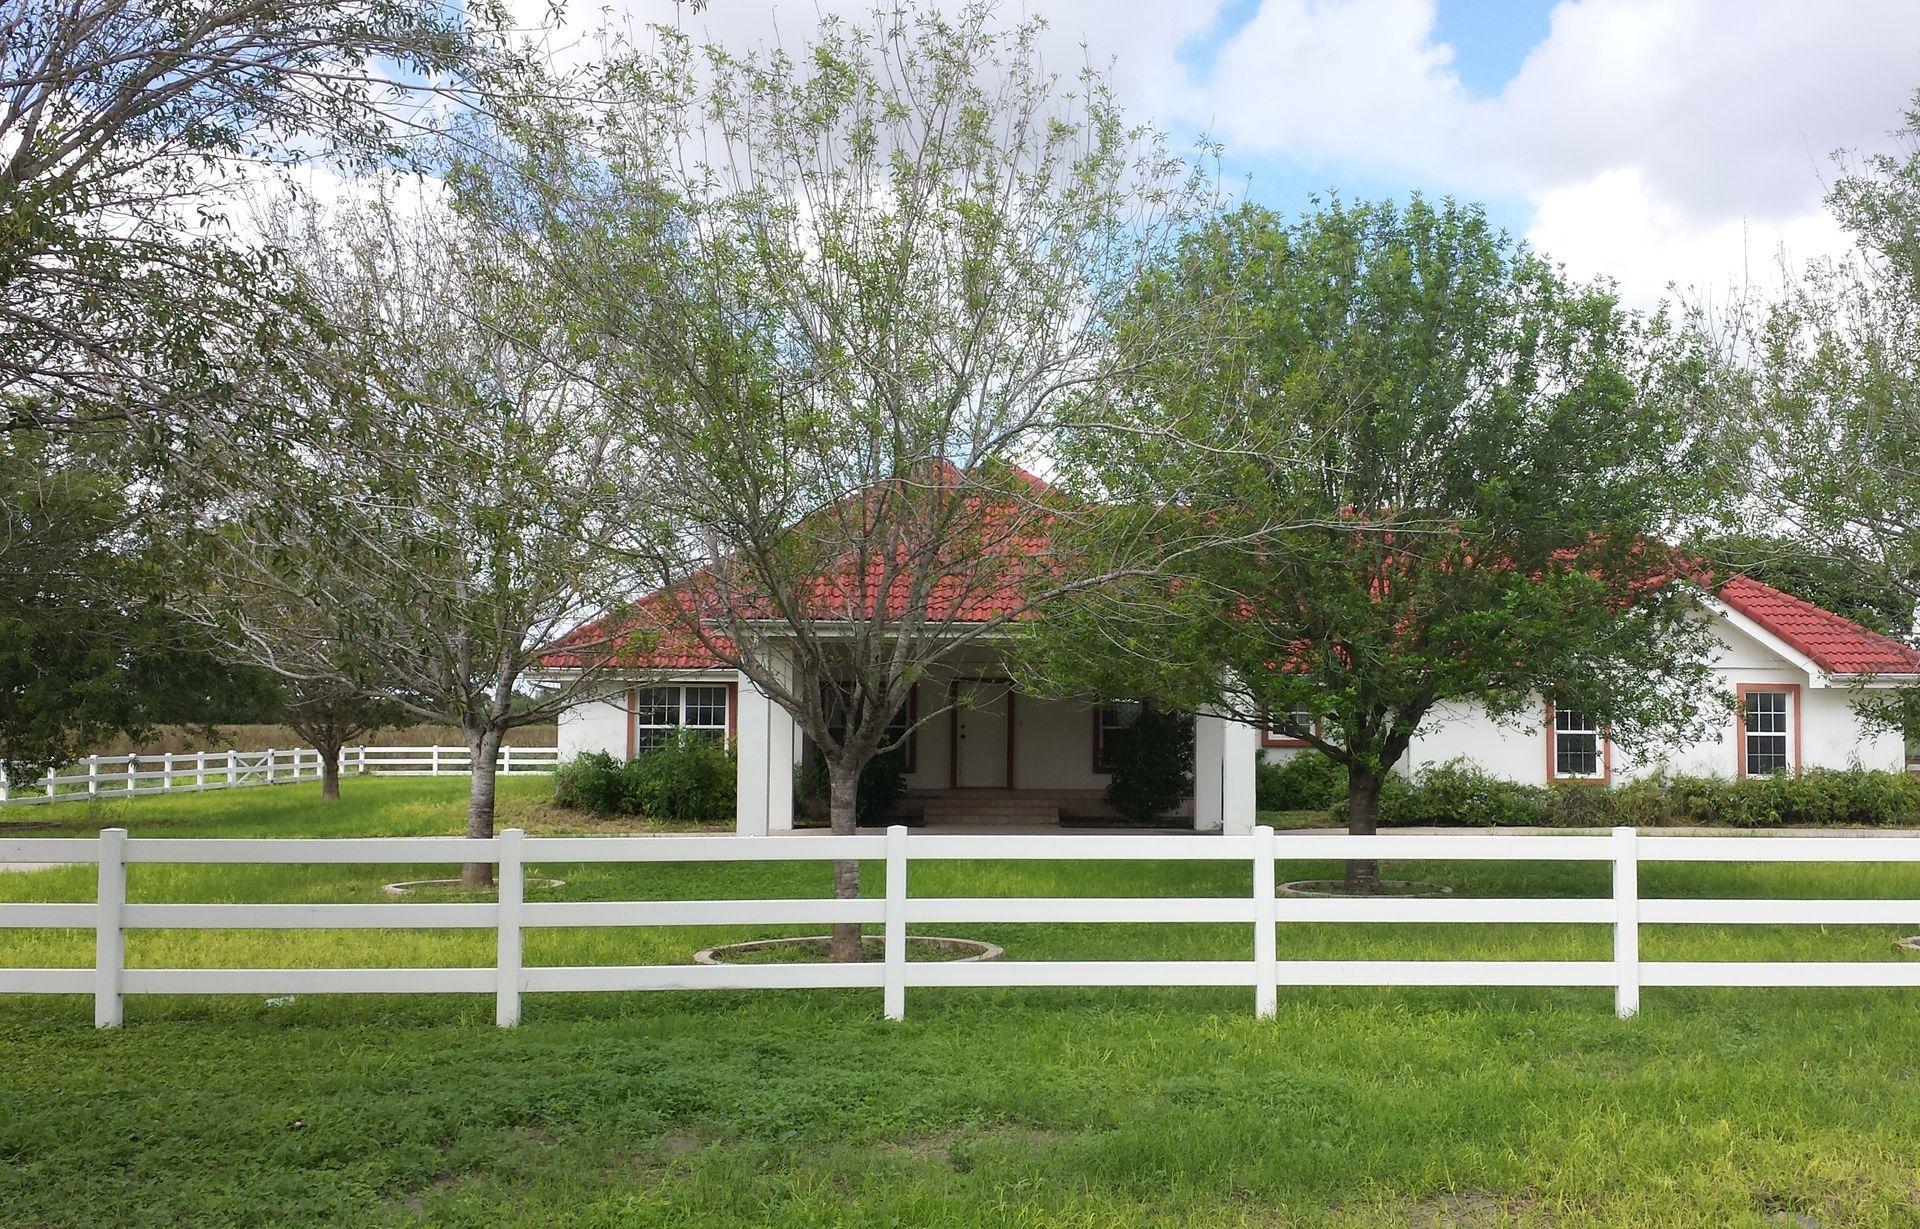 Texas Real estate - Property in EDINBURG,TX